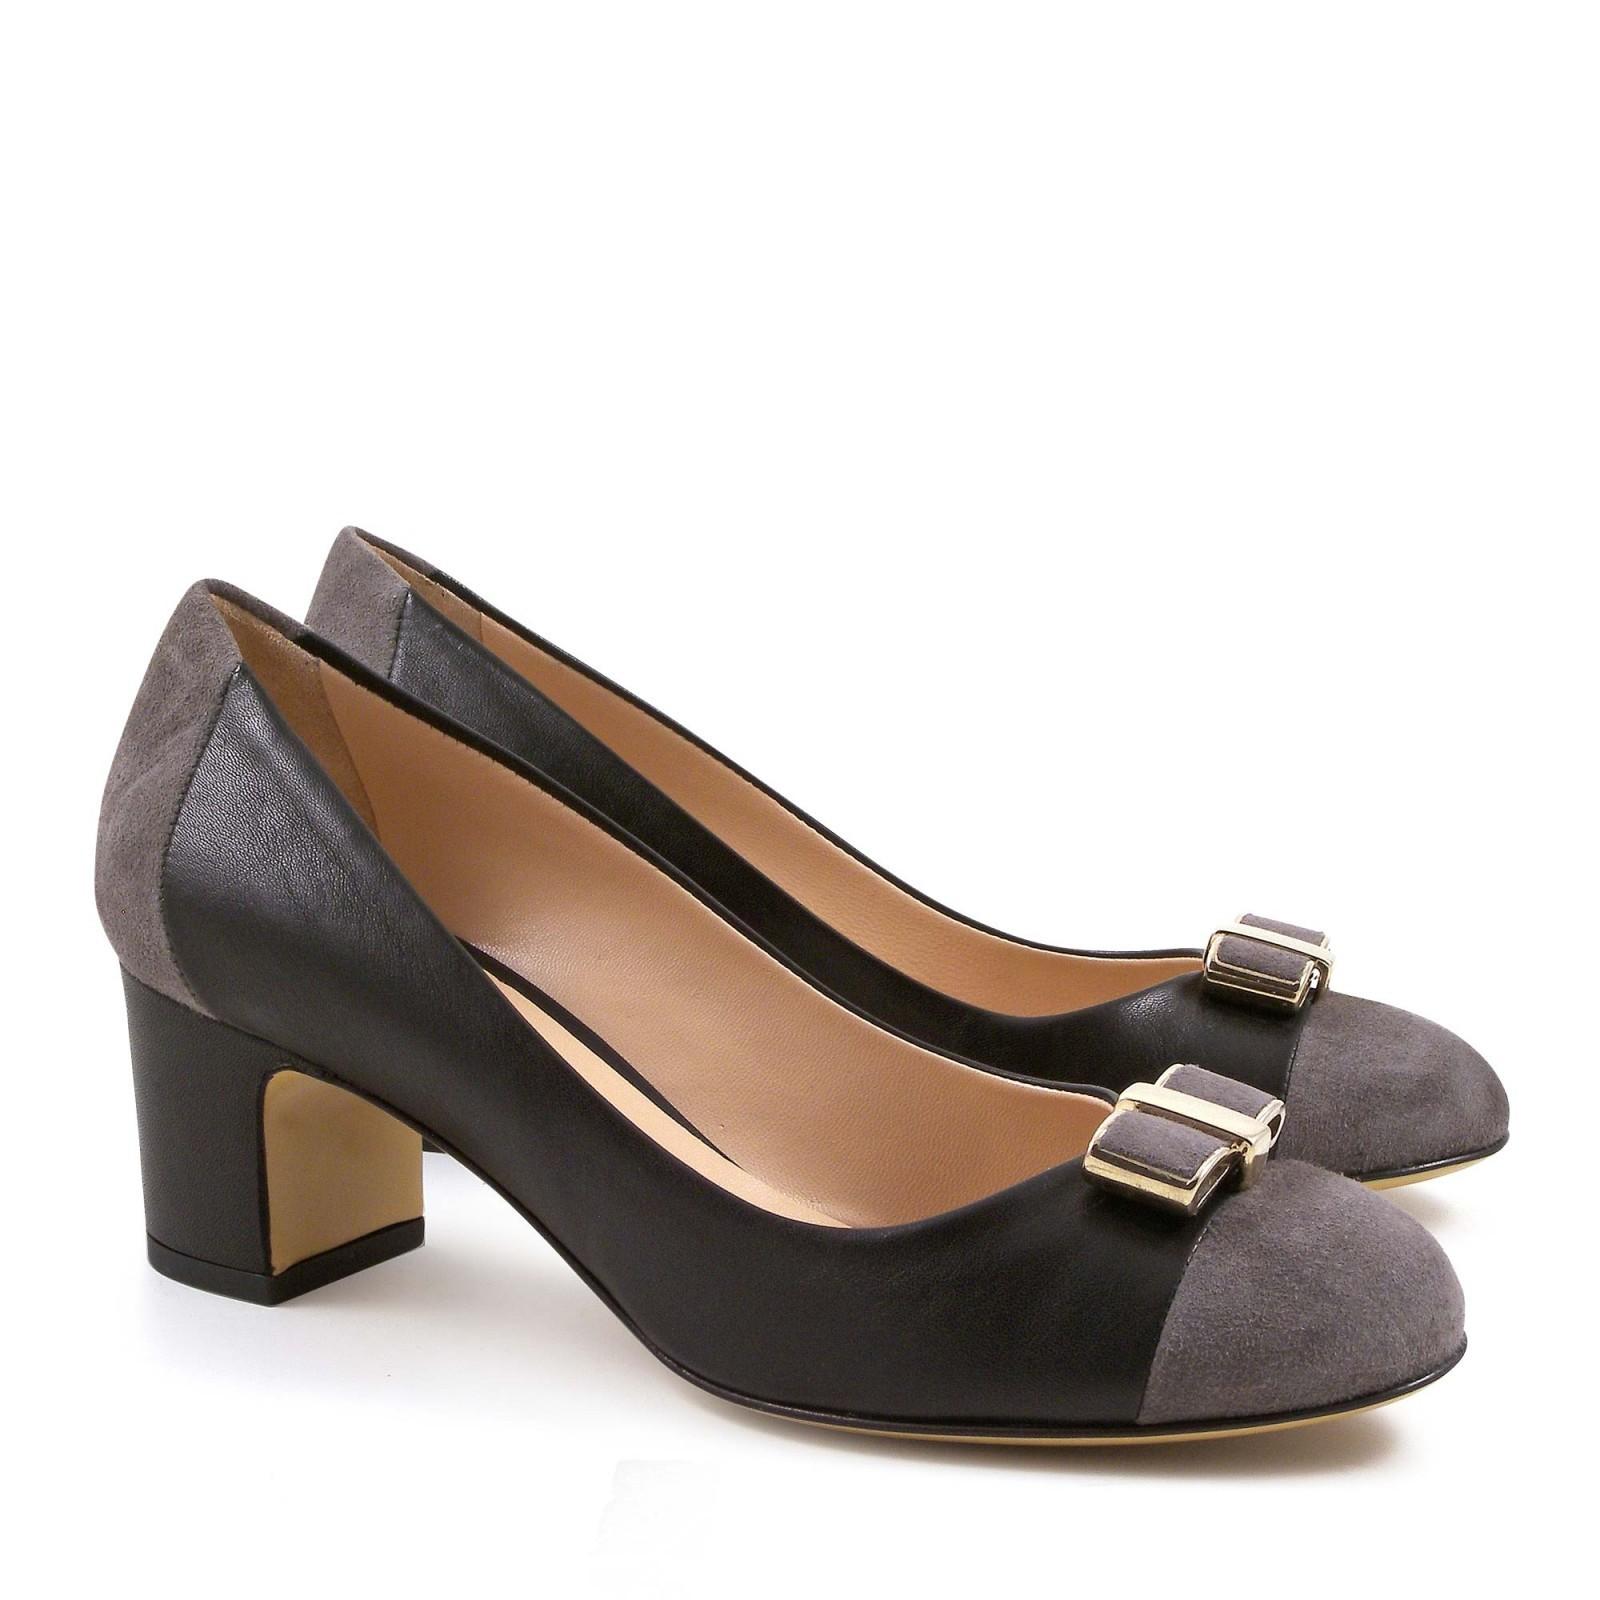 italian pumps shoes in black soft leather medium heels